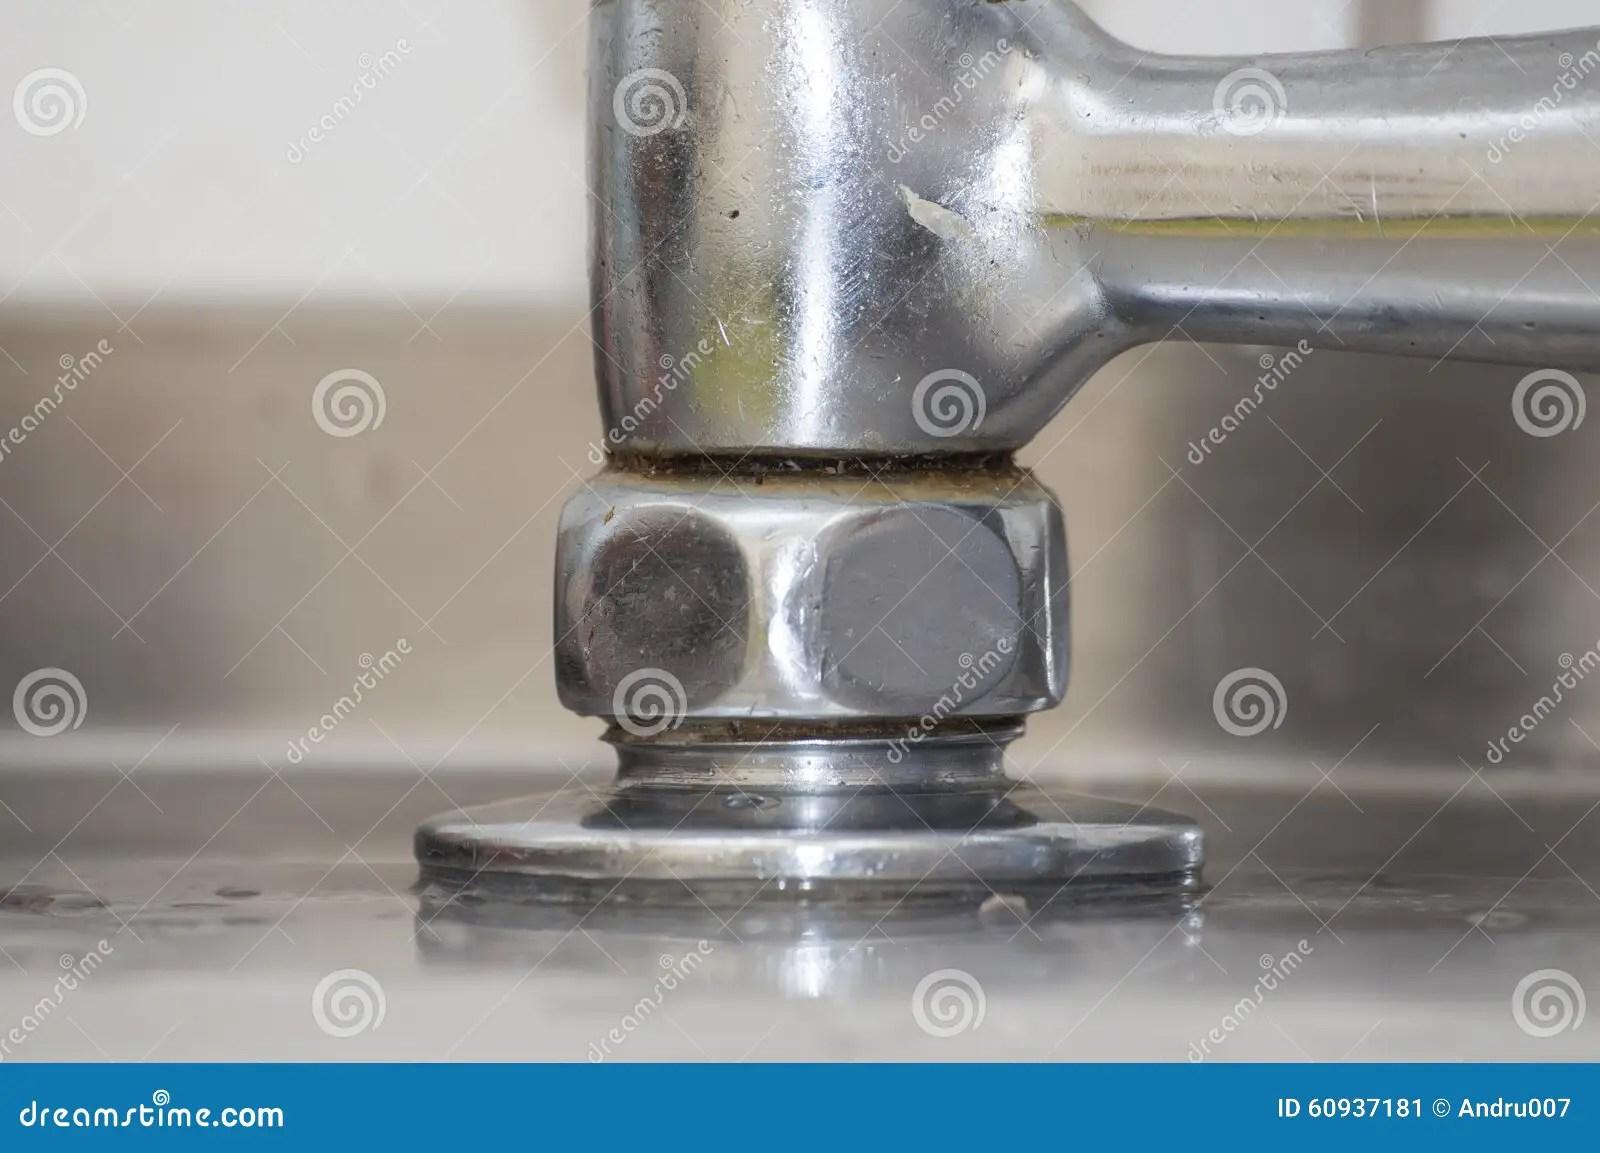 kitchen faucet spout wayfair cart 搅拌器 喷口木盆库存图片 图片包括有减速火箭 成象 grunge 镀铬物 老 肮脏的厨房龙头搅拌器 特写镜头